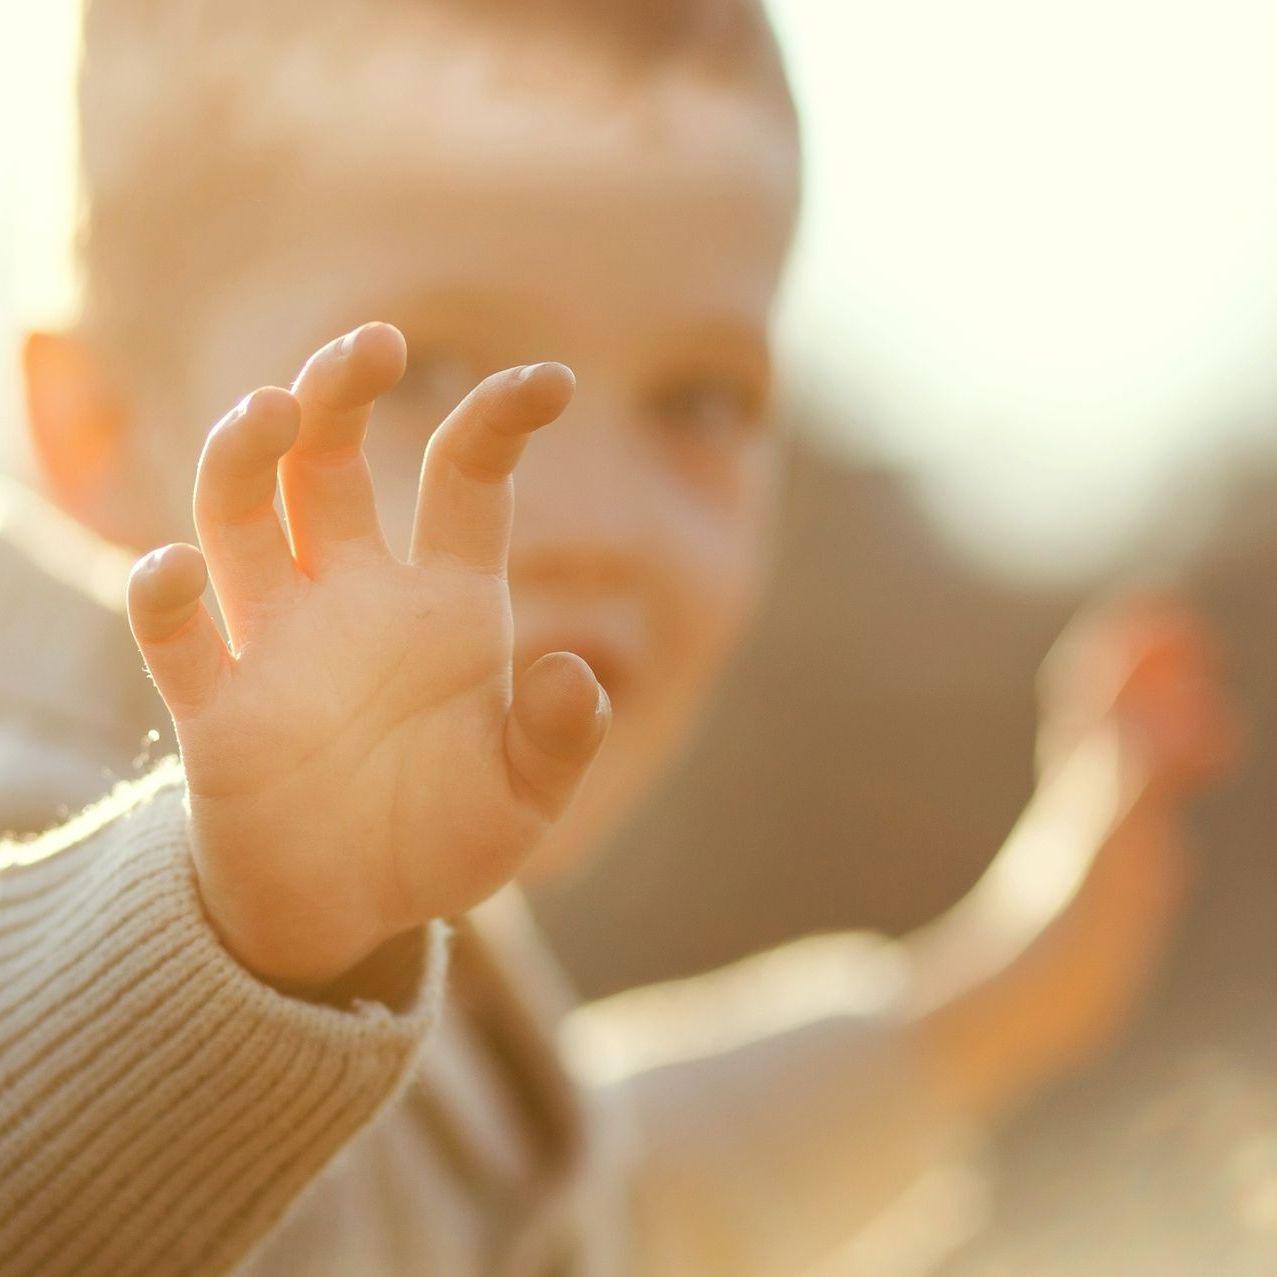 When Your Child Seems Stuck Seeking Negative Attention - Janet Lansbury